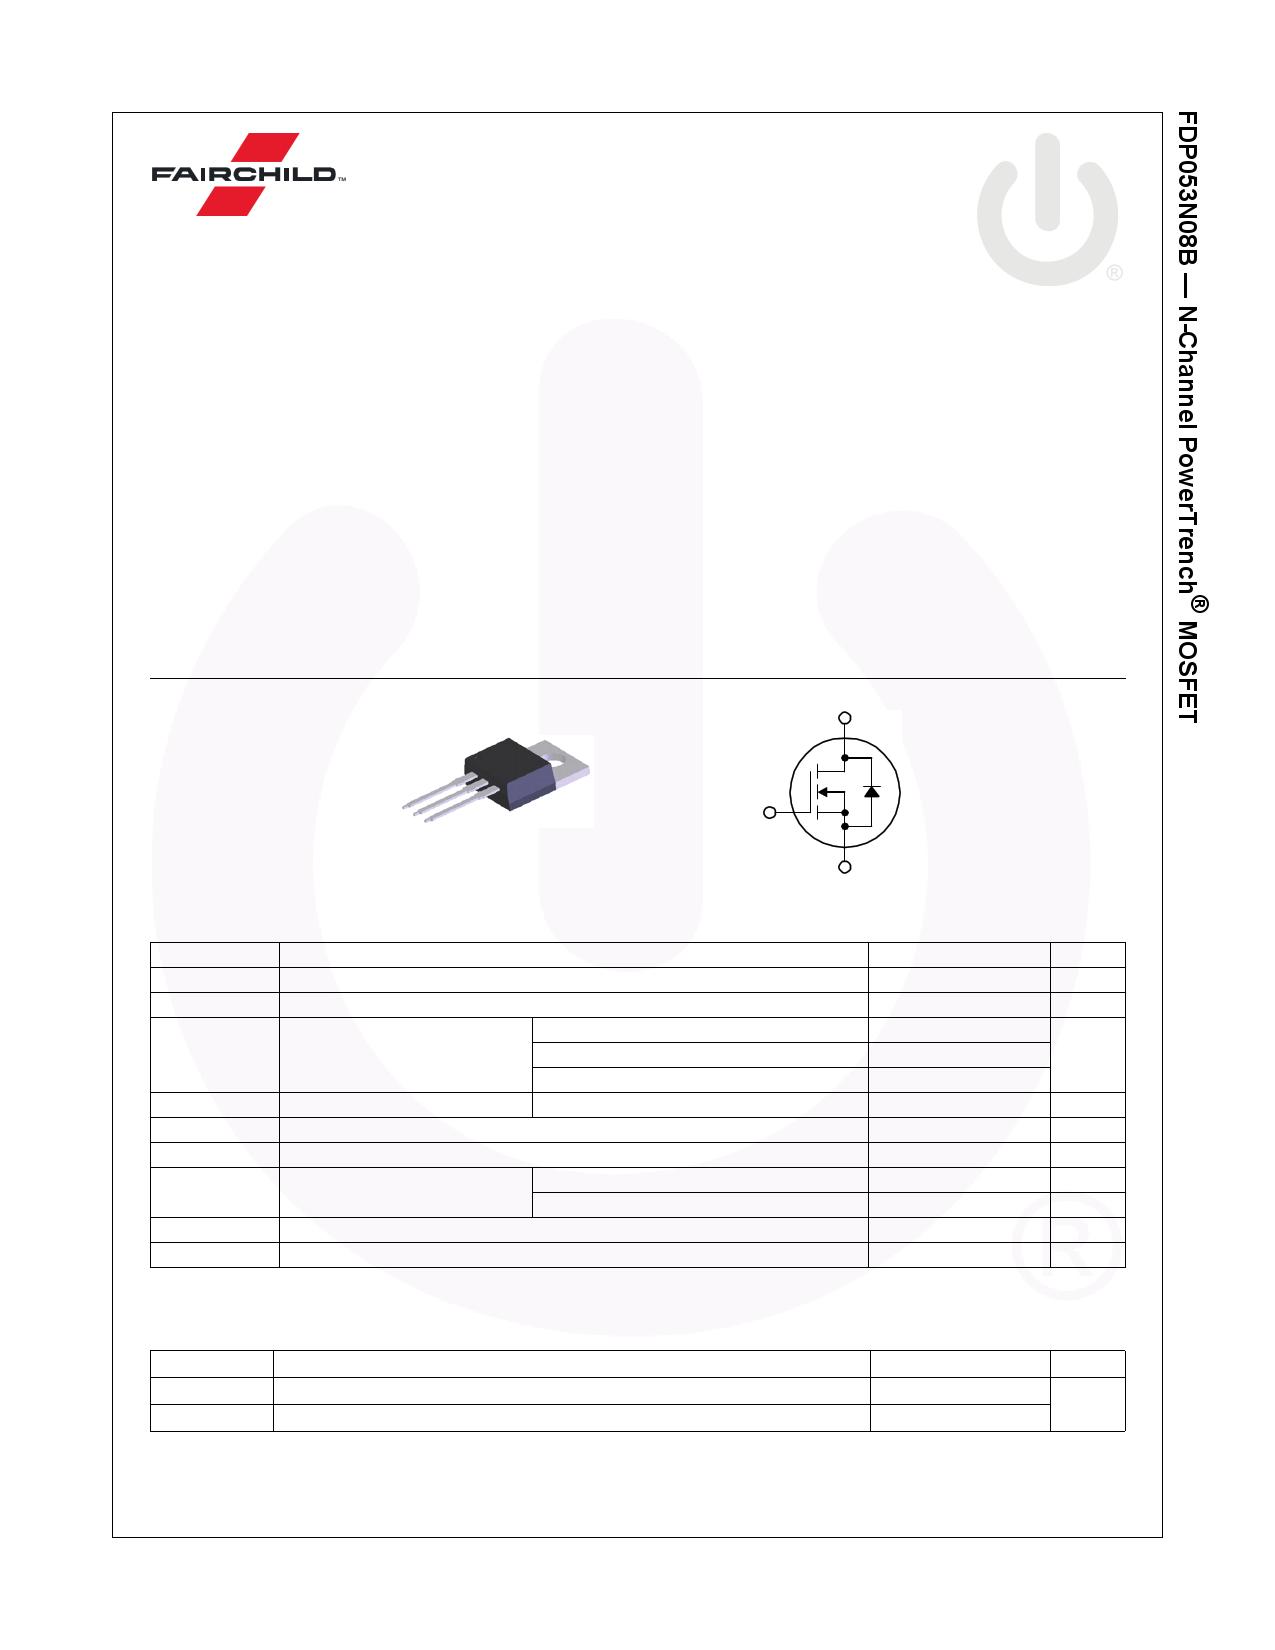 FDP053N08B datasheet